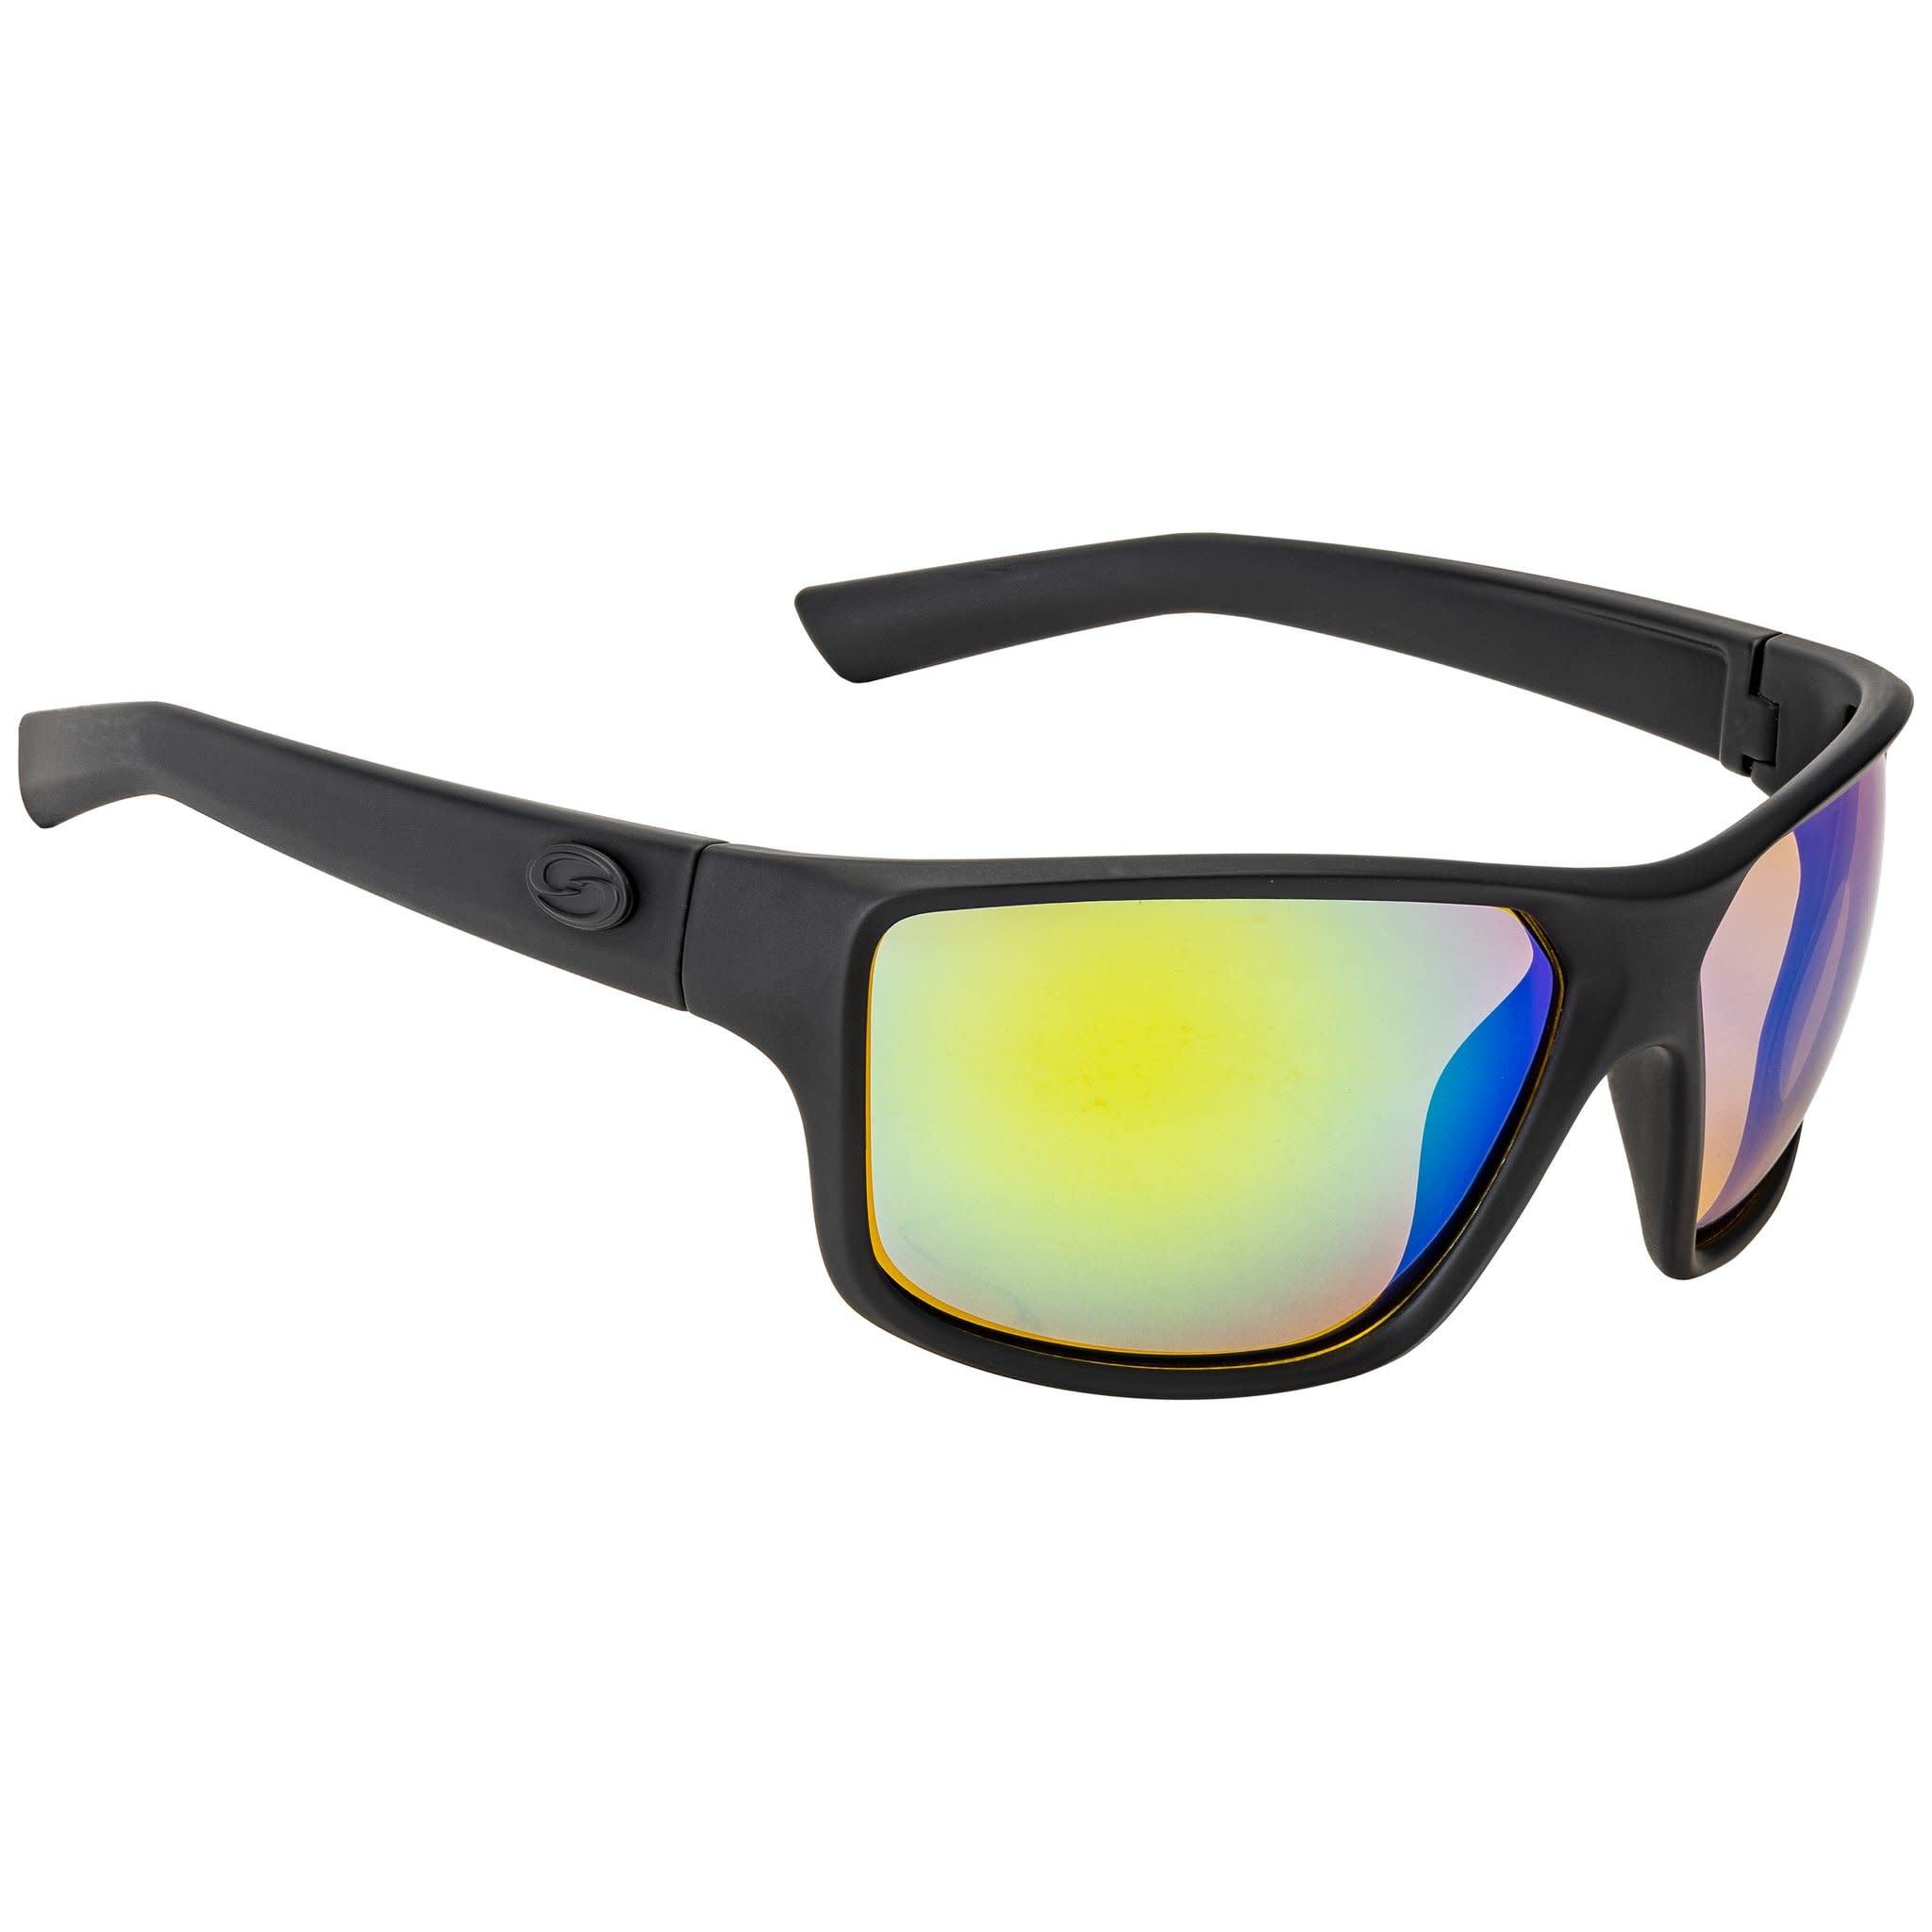 Strike King Strike King SG-S11401 S11 Optics Clinch Sunglasses Polarized, Matte Black/Green Mirror Amber Base